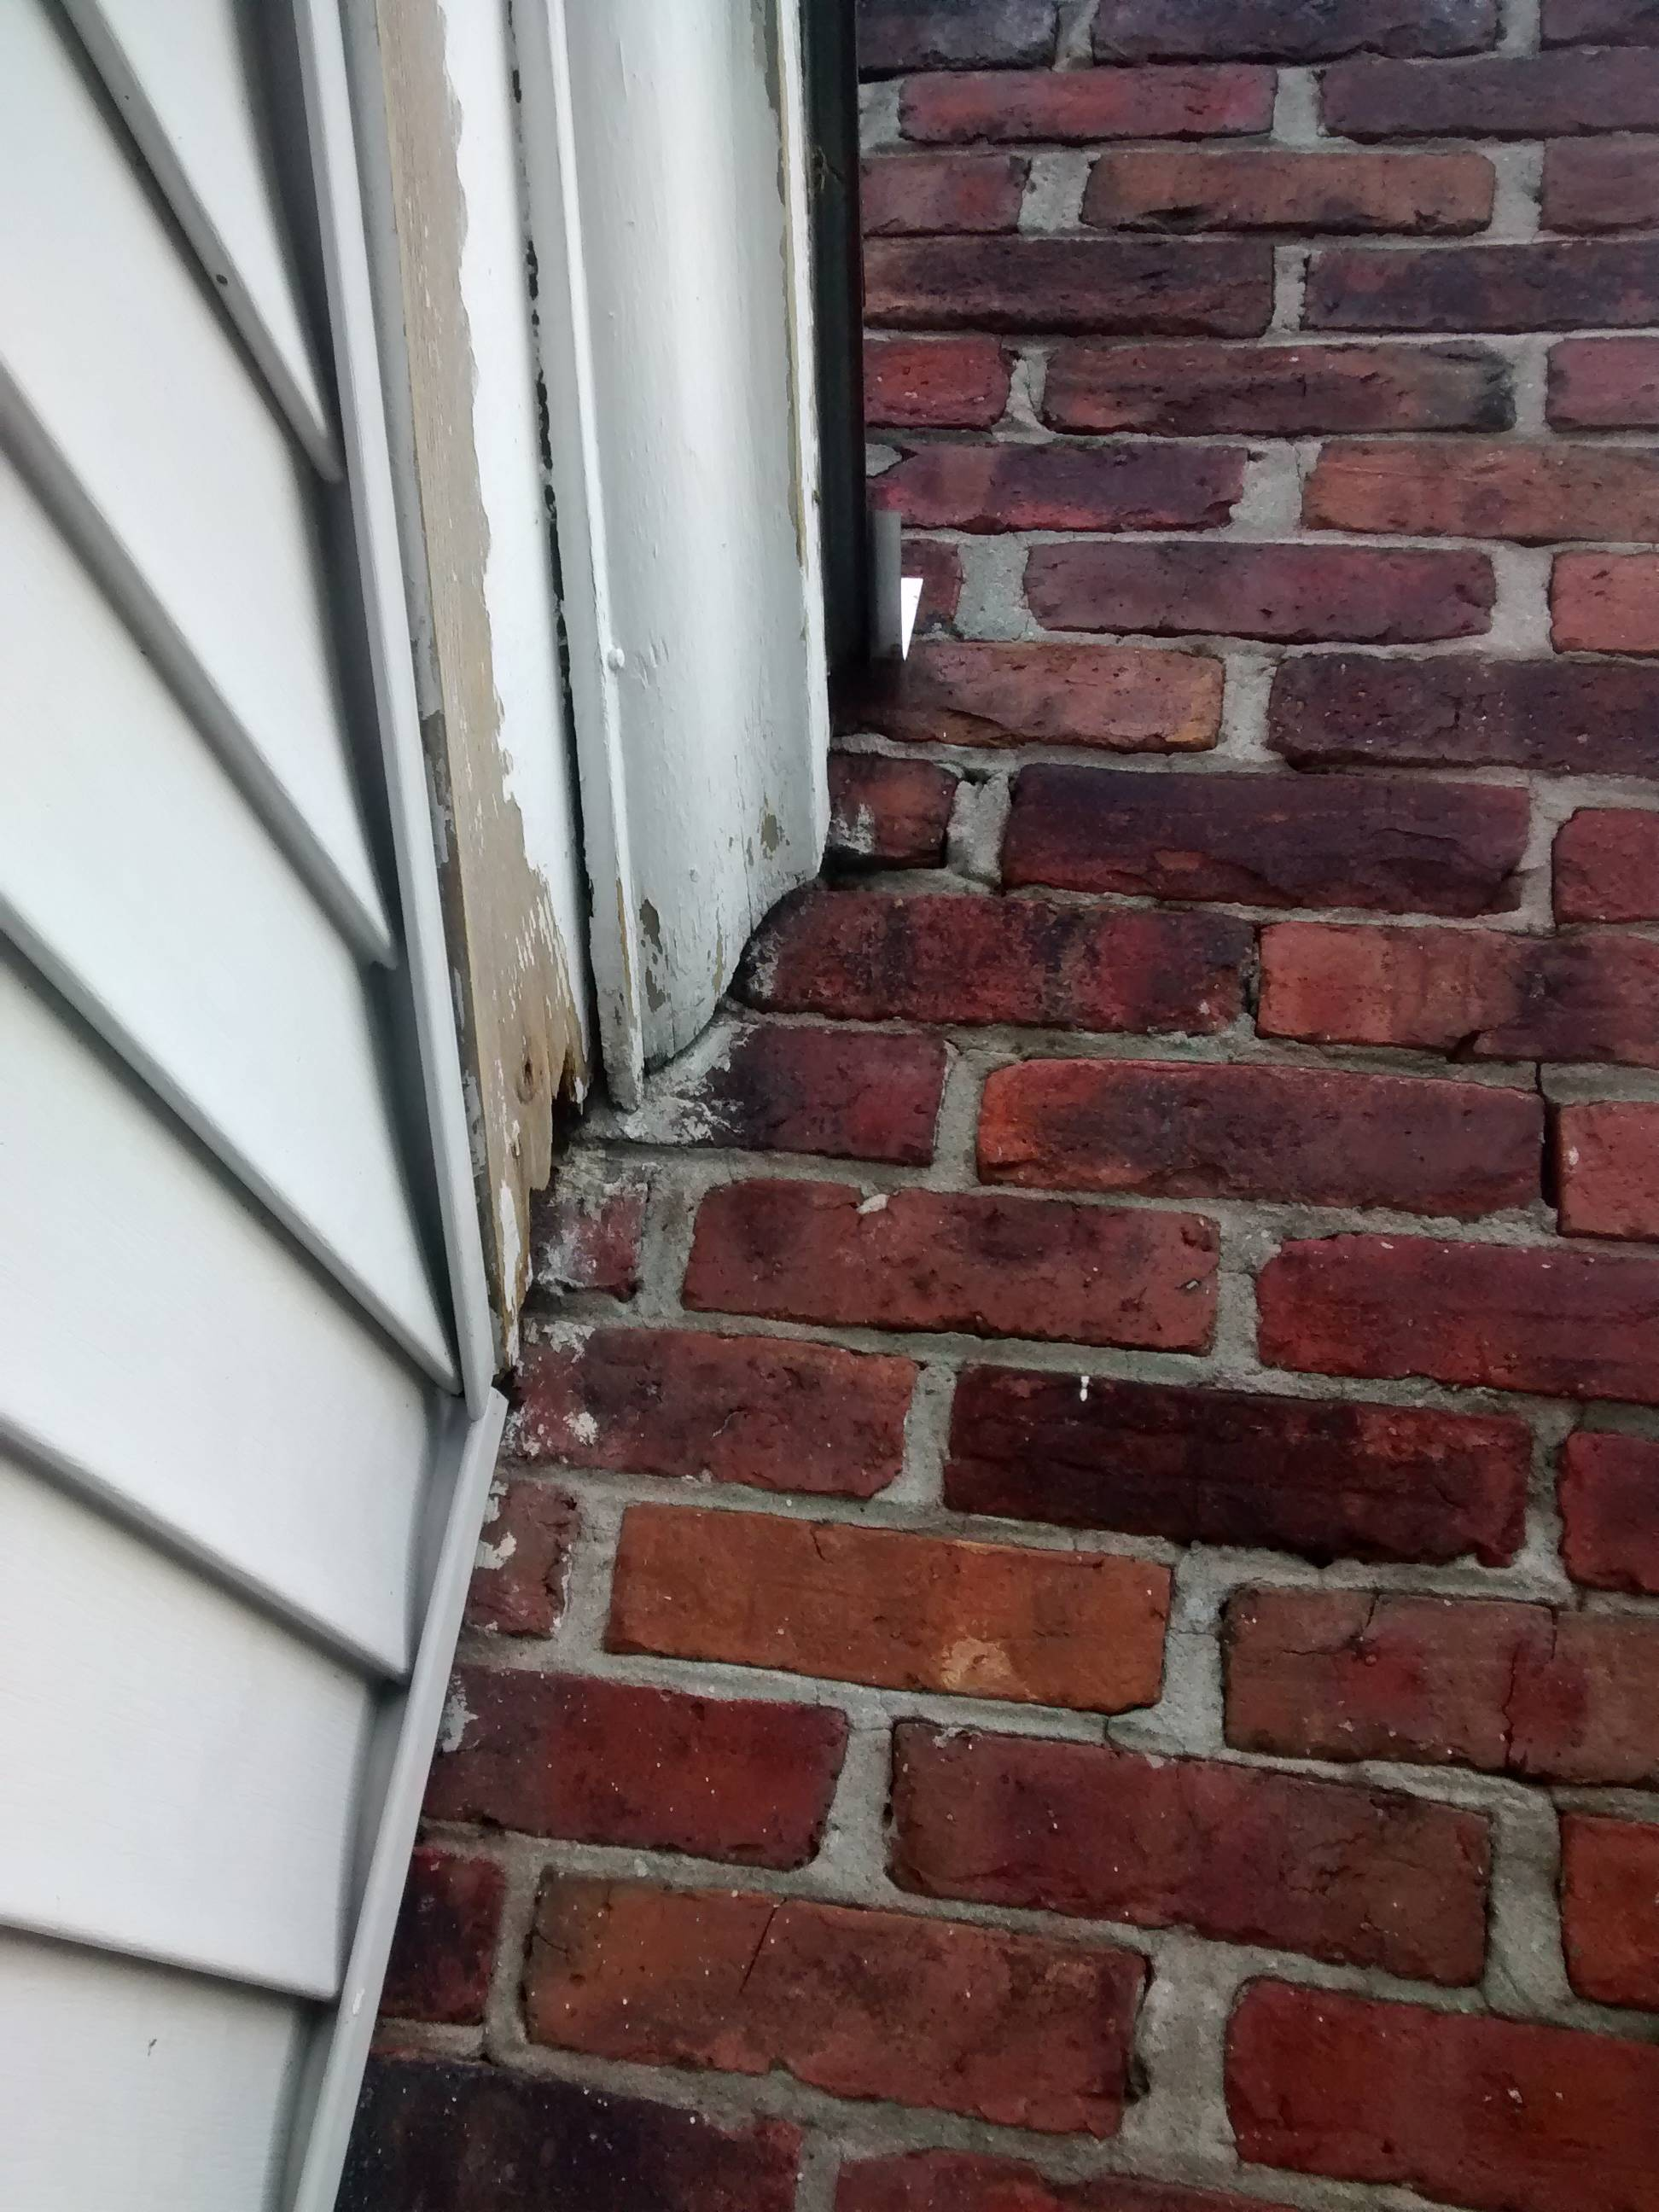 How Should I Protect Wooden Trim That Abuts A Brick